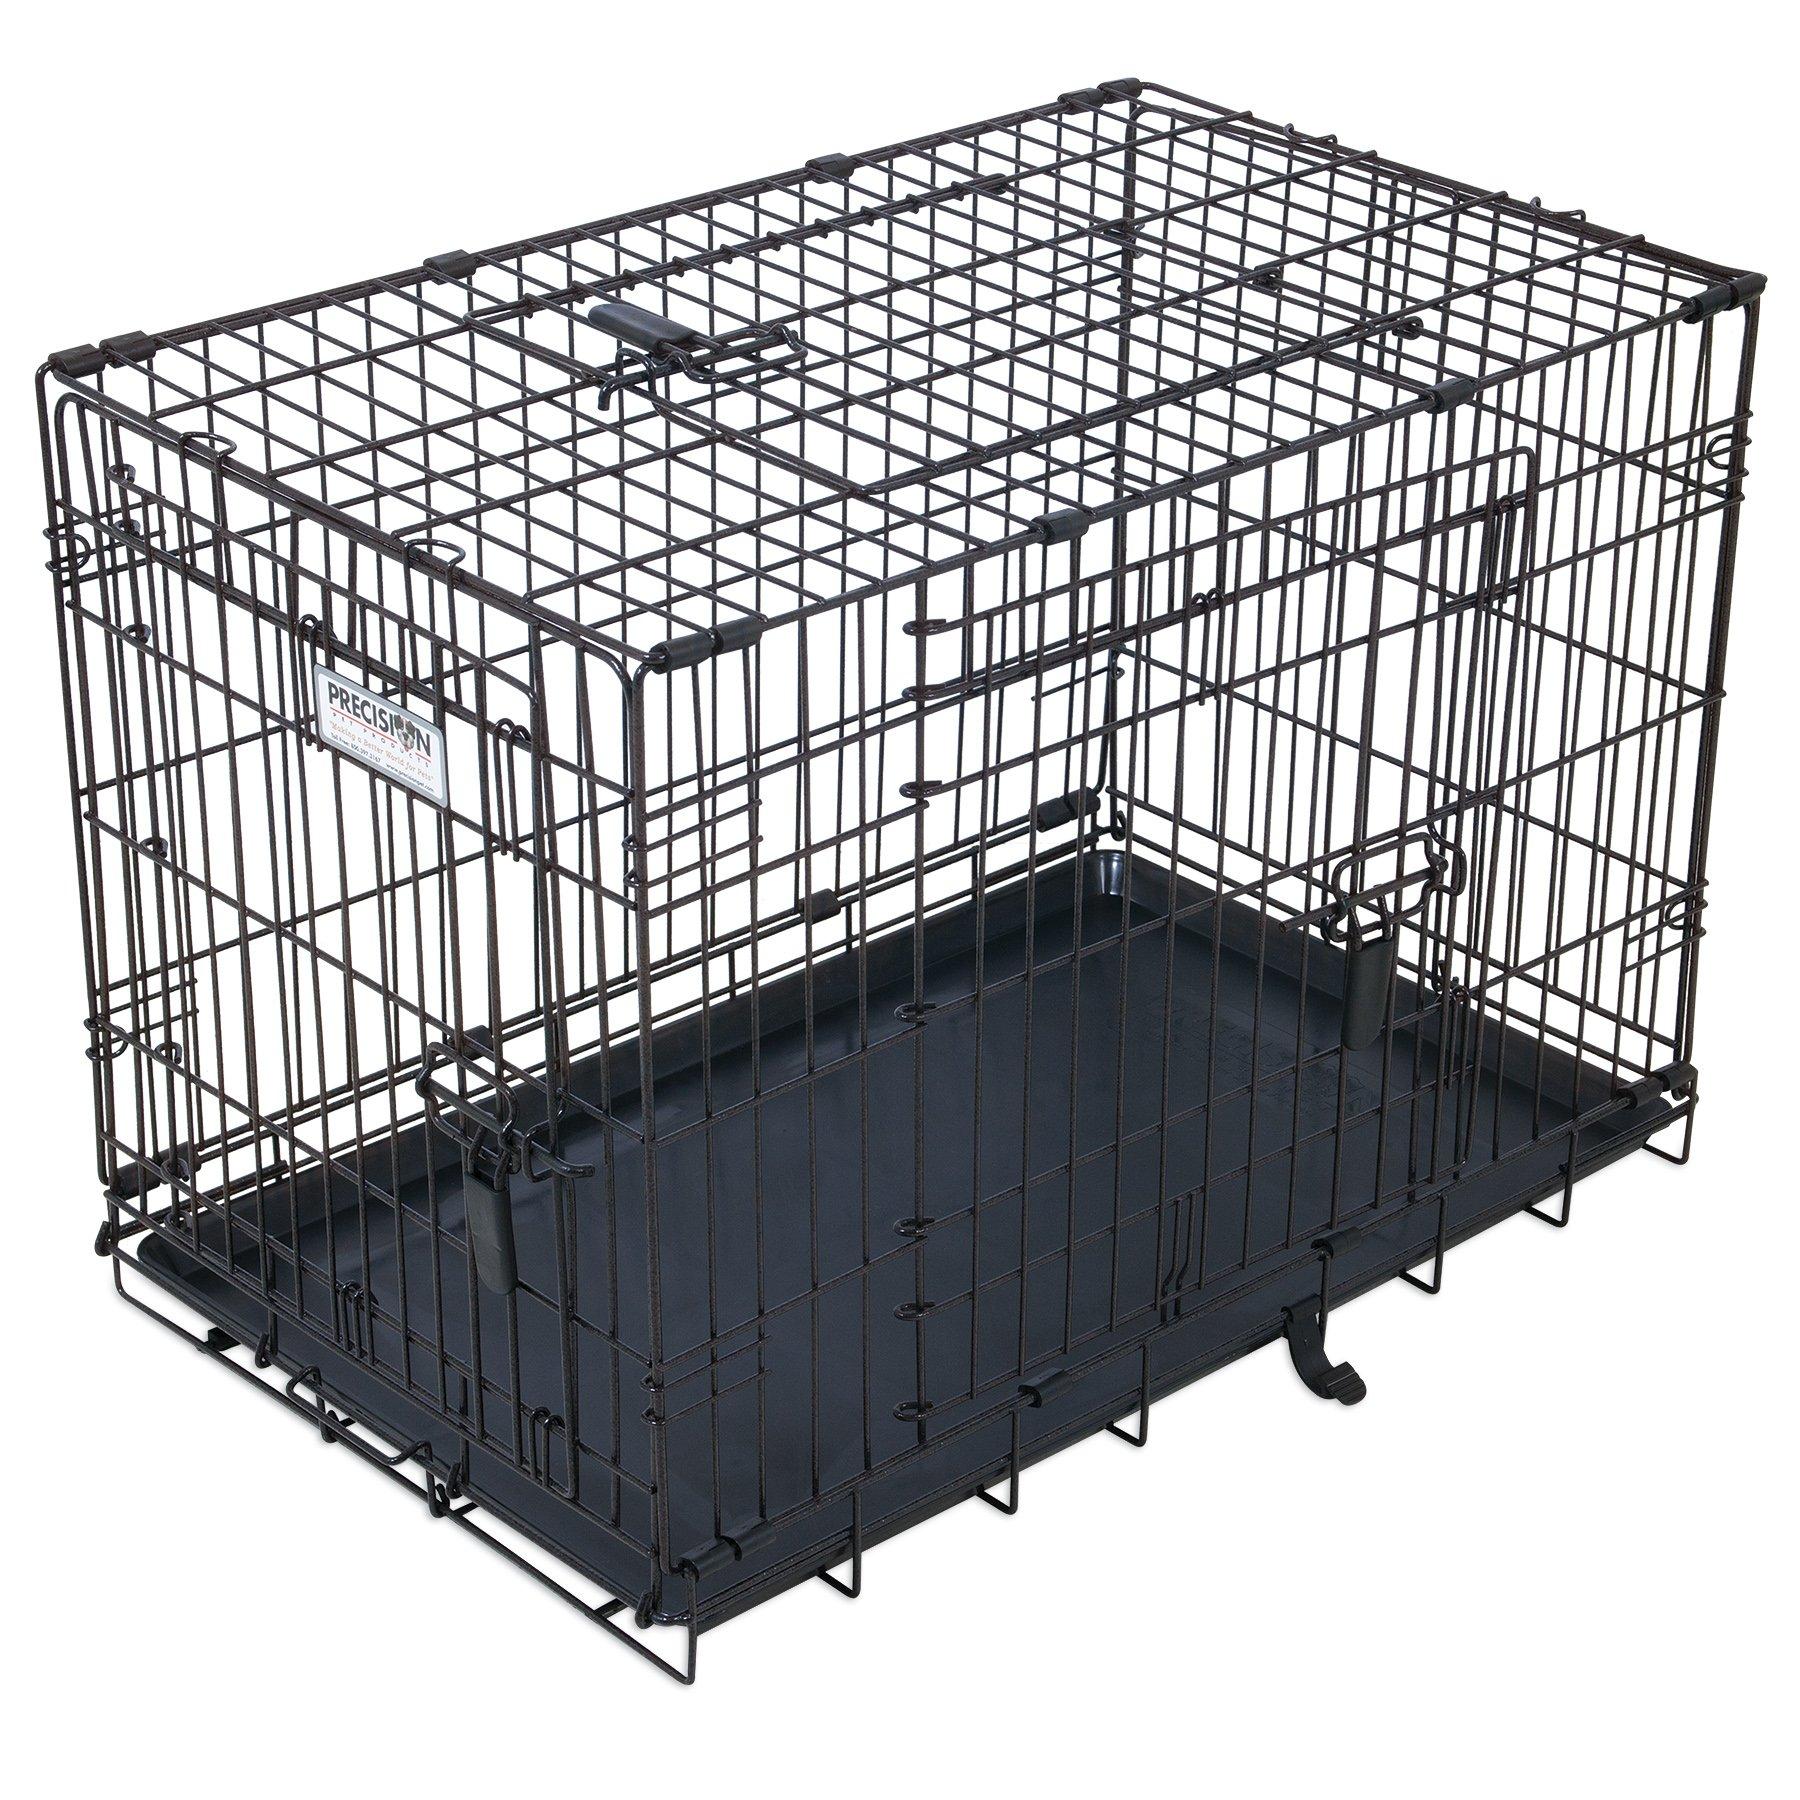 Petmate Triple-Door Great Crate Elite, by Precision